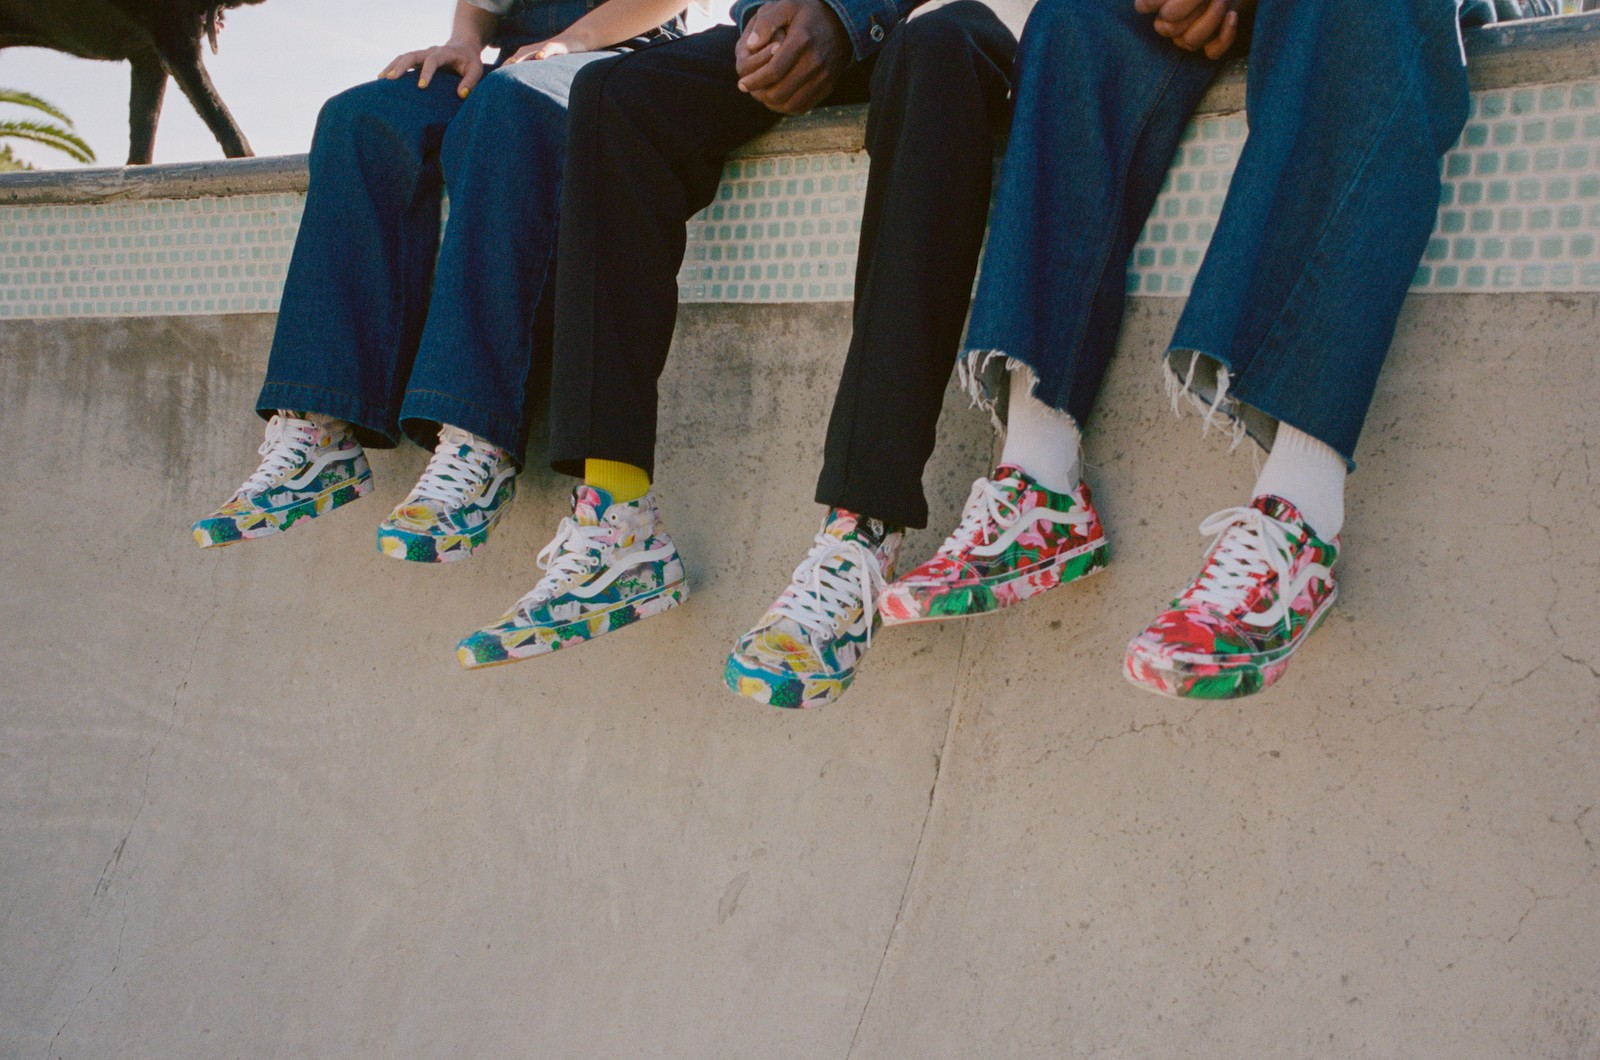 KENZO vans collaboration capsule footwear ready to wear old skool sk8 hi felipe oliveira baptista the skateroom